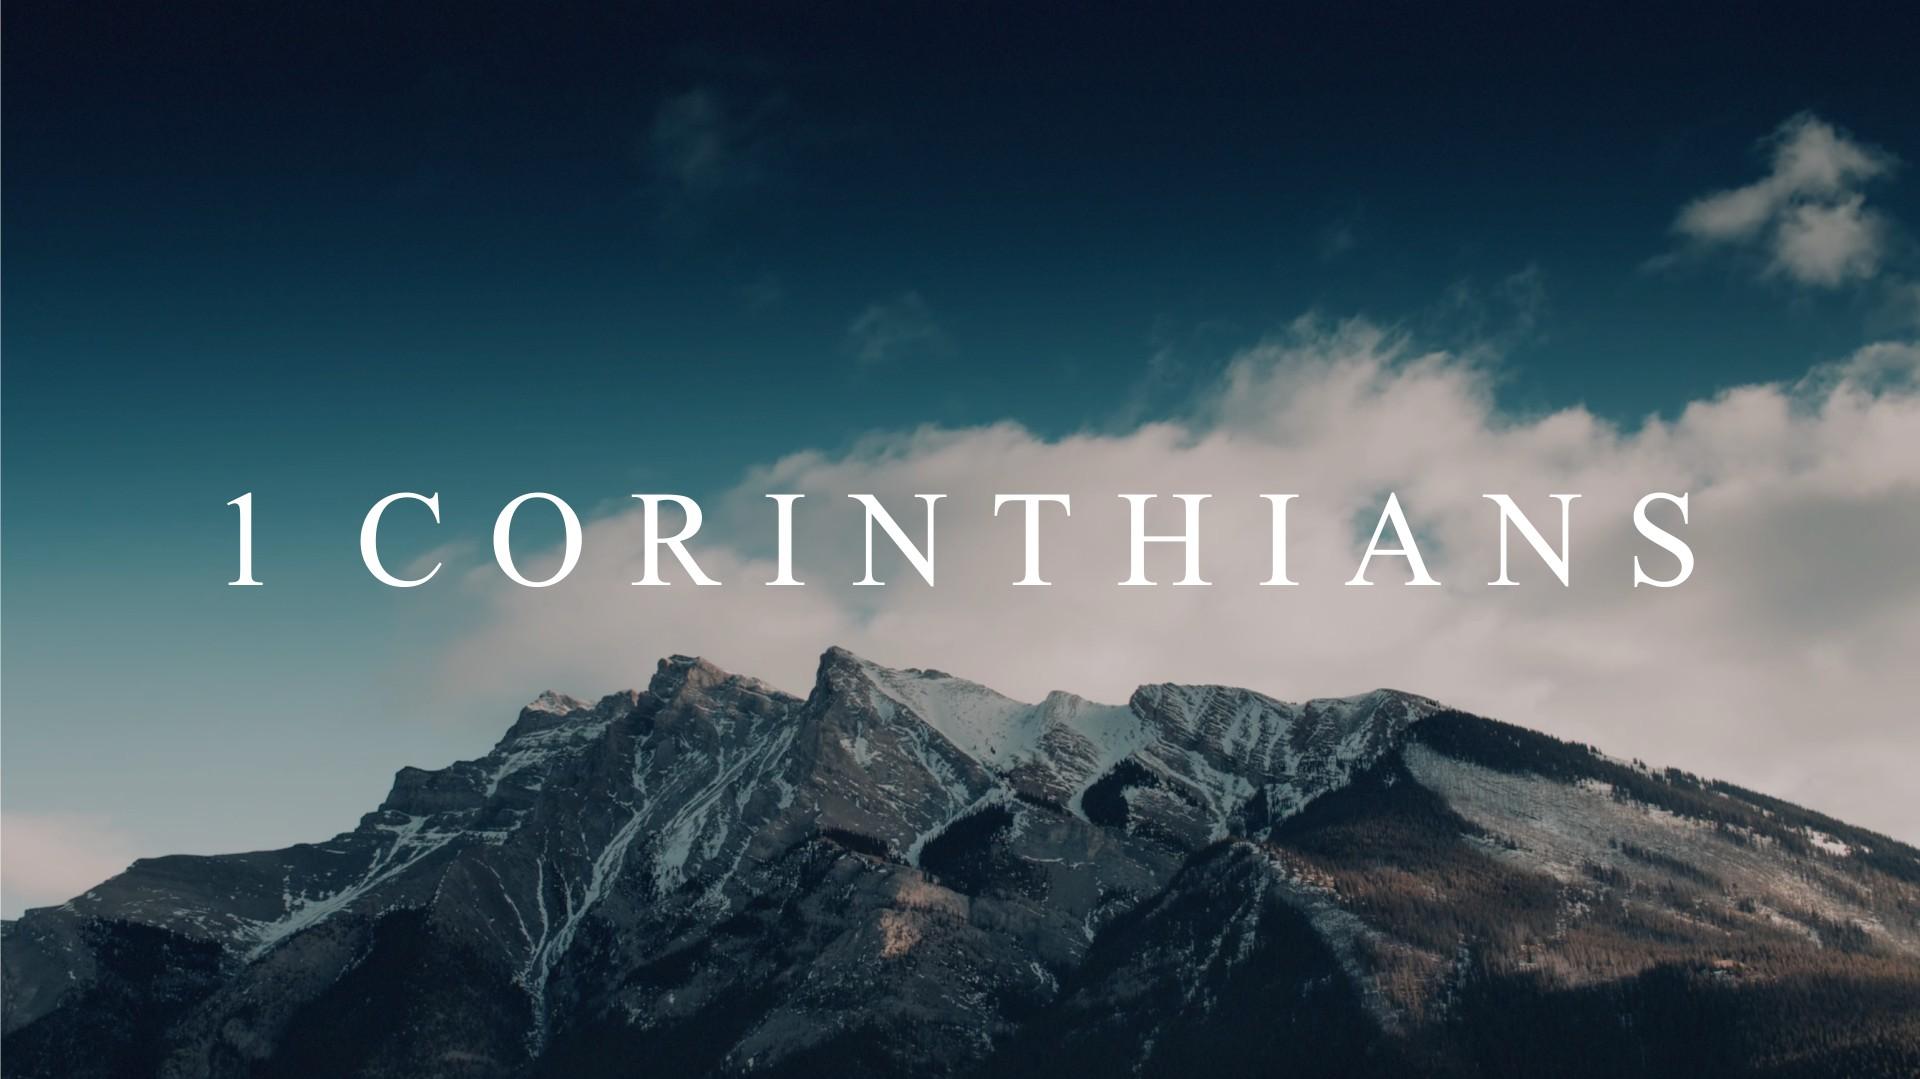 1-Corinthians-title-slide.jpg